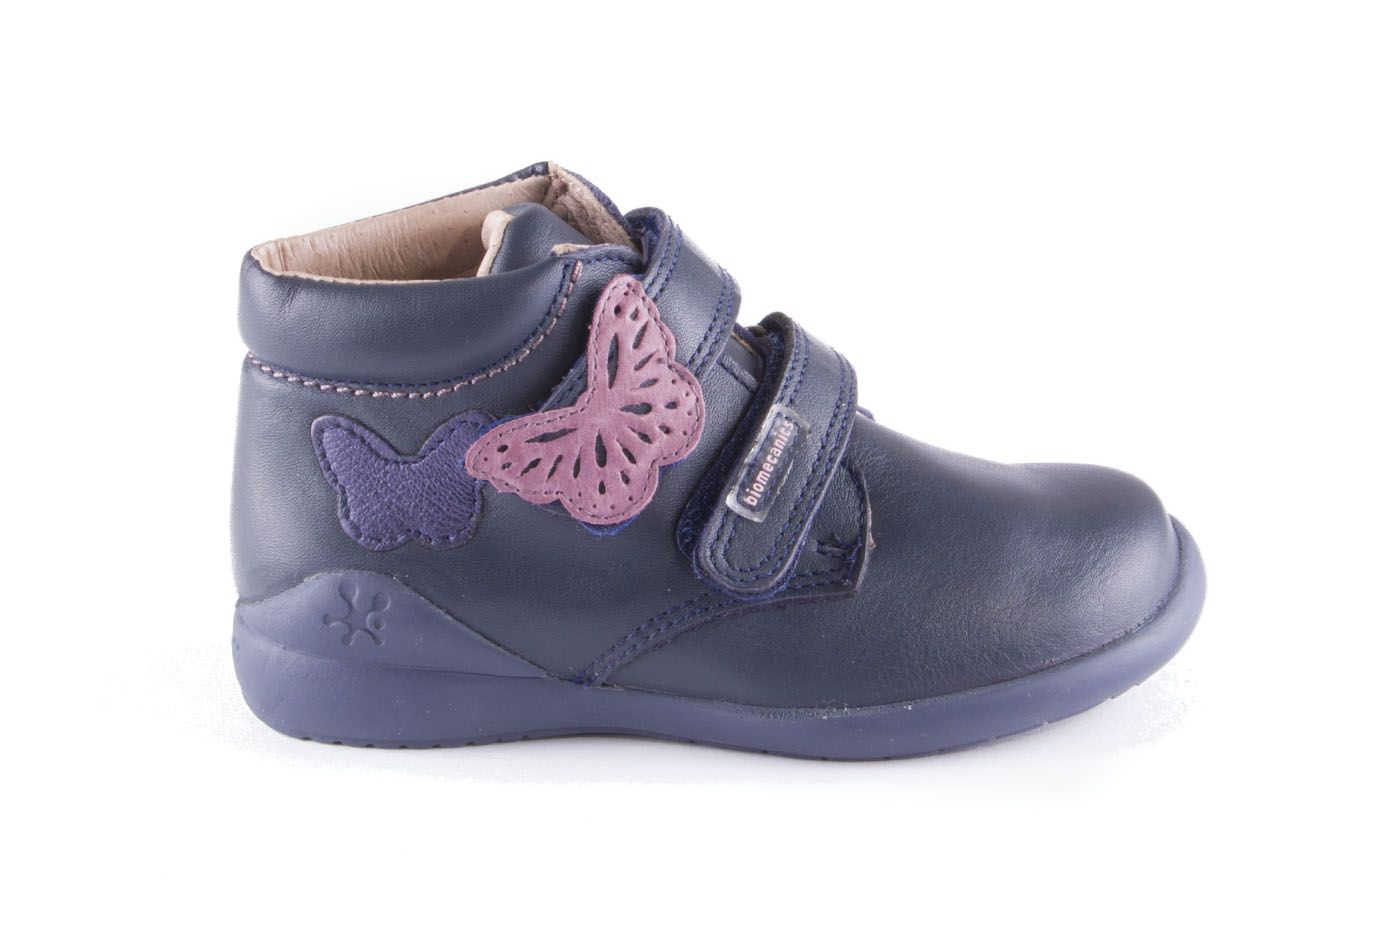 d8decbbba0b Comprar zapato tipo JOVEN NIÑA estilo BOTAS COLOR AZUL PIEL